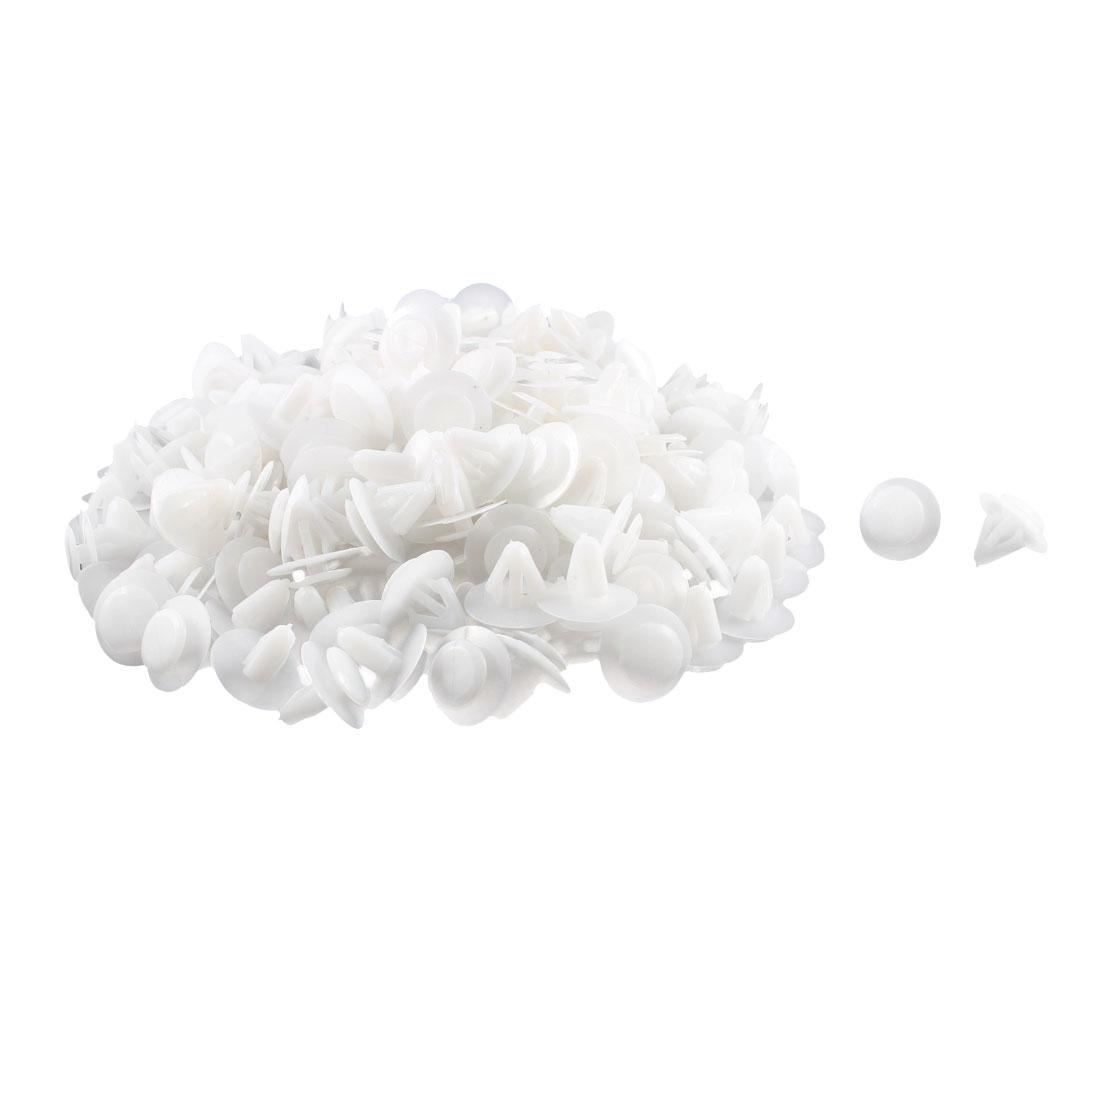 200 Pcs White Plastic Rivet Trim Fastener Retainer Clips 10mm x 13mm x 19mm